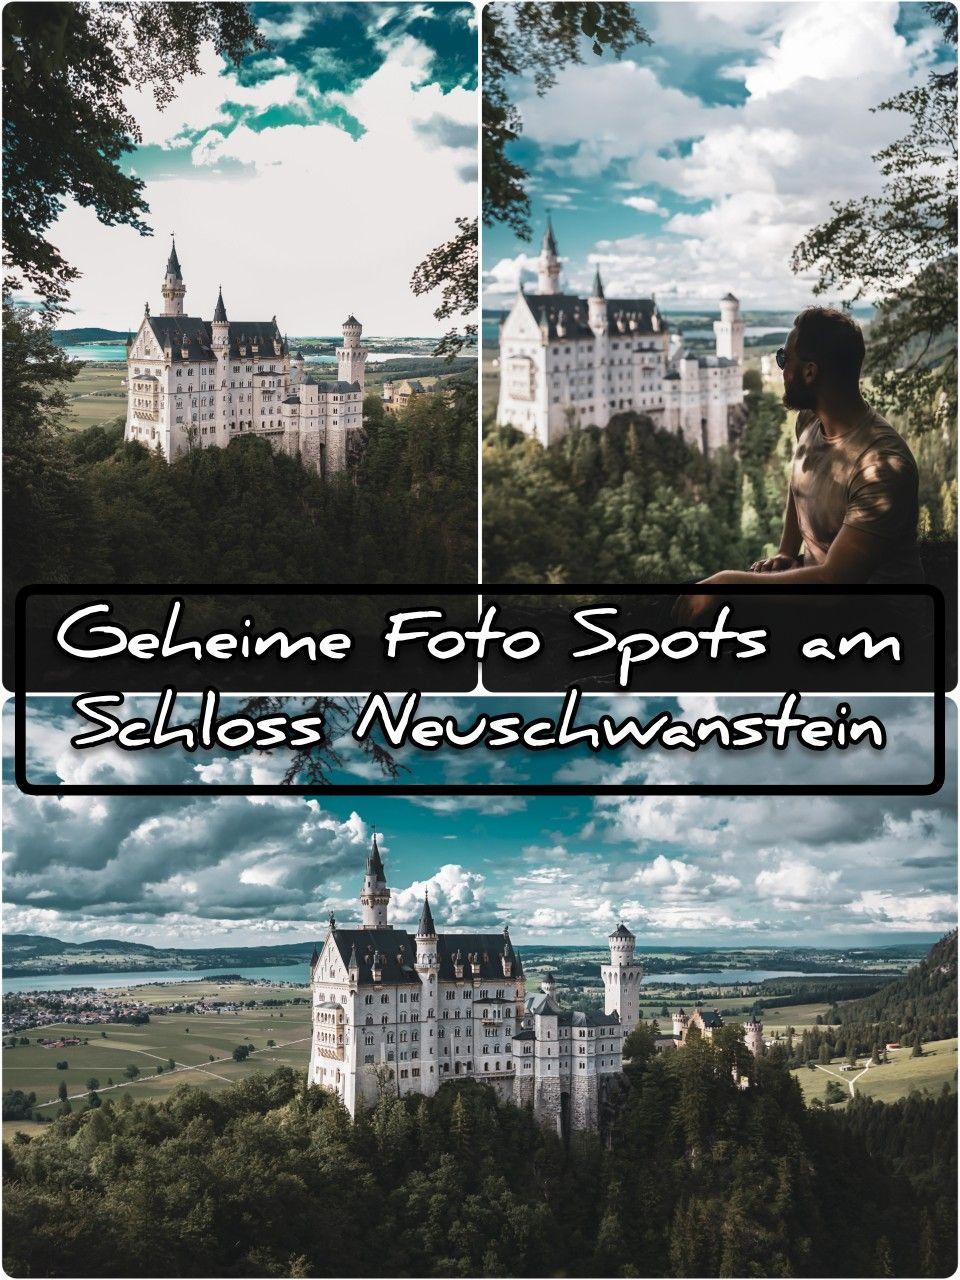 Geheime Secret Instagram Foto Spots Am Schloss Neuschwanstein Nun Auf Dem Blog Ort Tag Google Maps In 2020 Neuschwanstein Schloss Neuschwanstein Instagram Foto